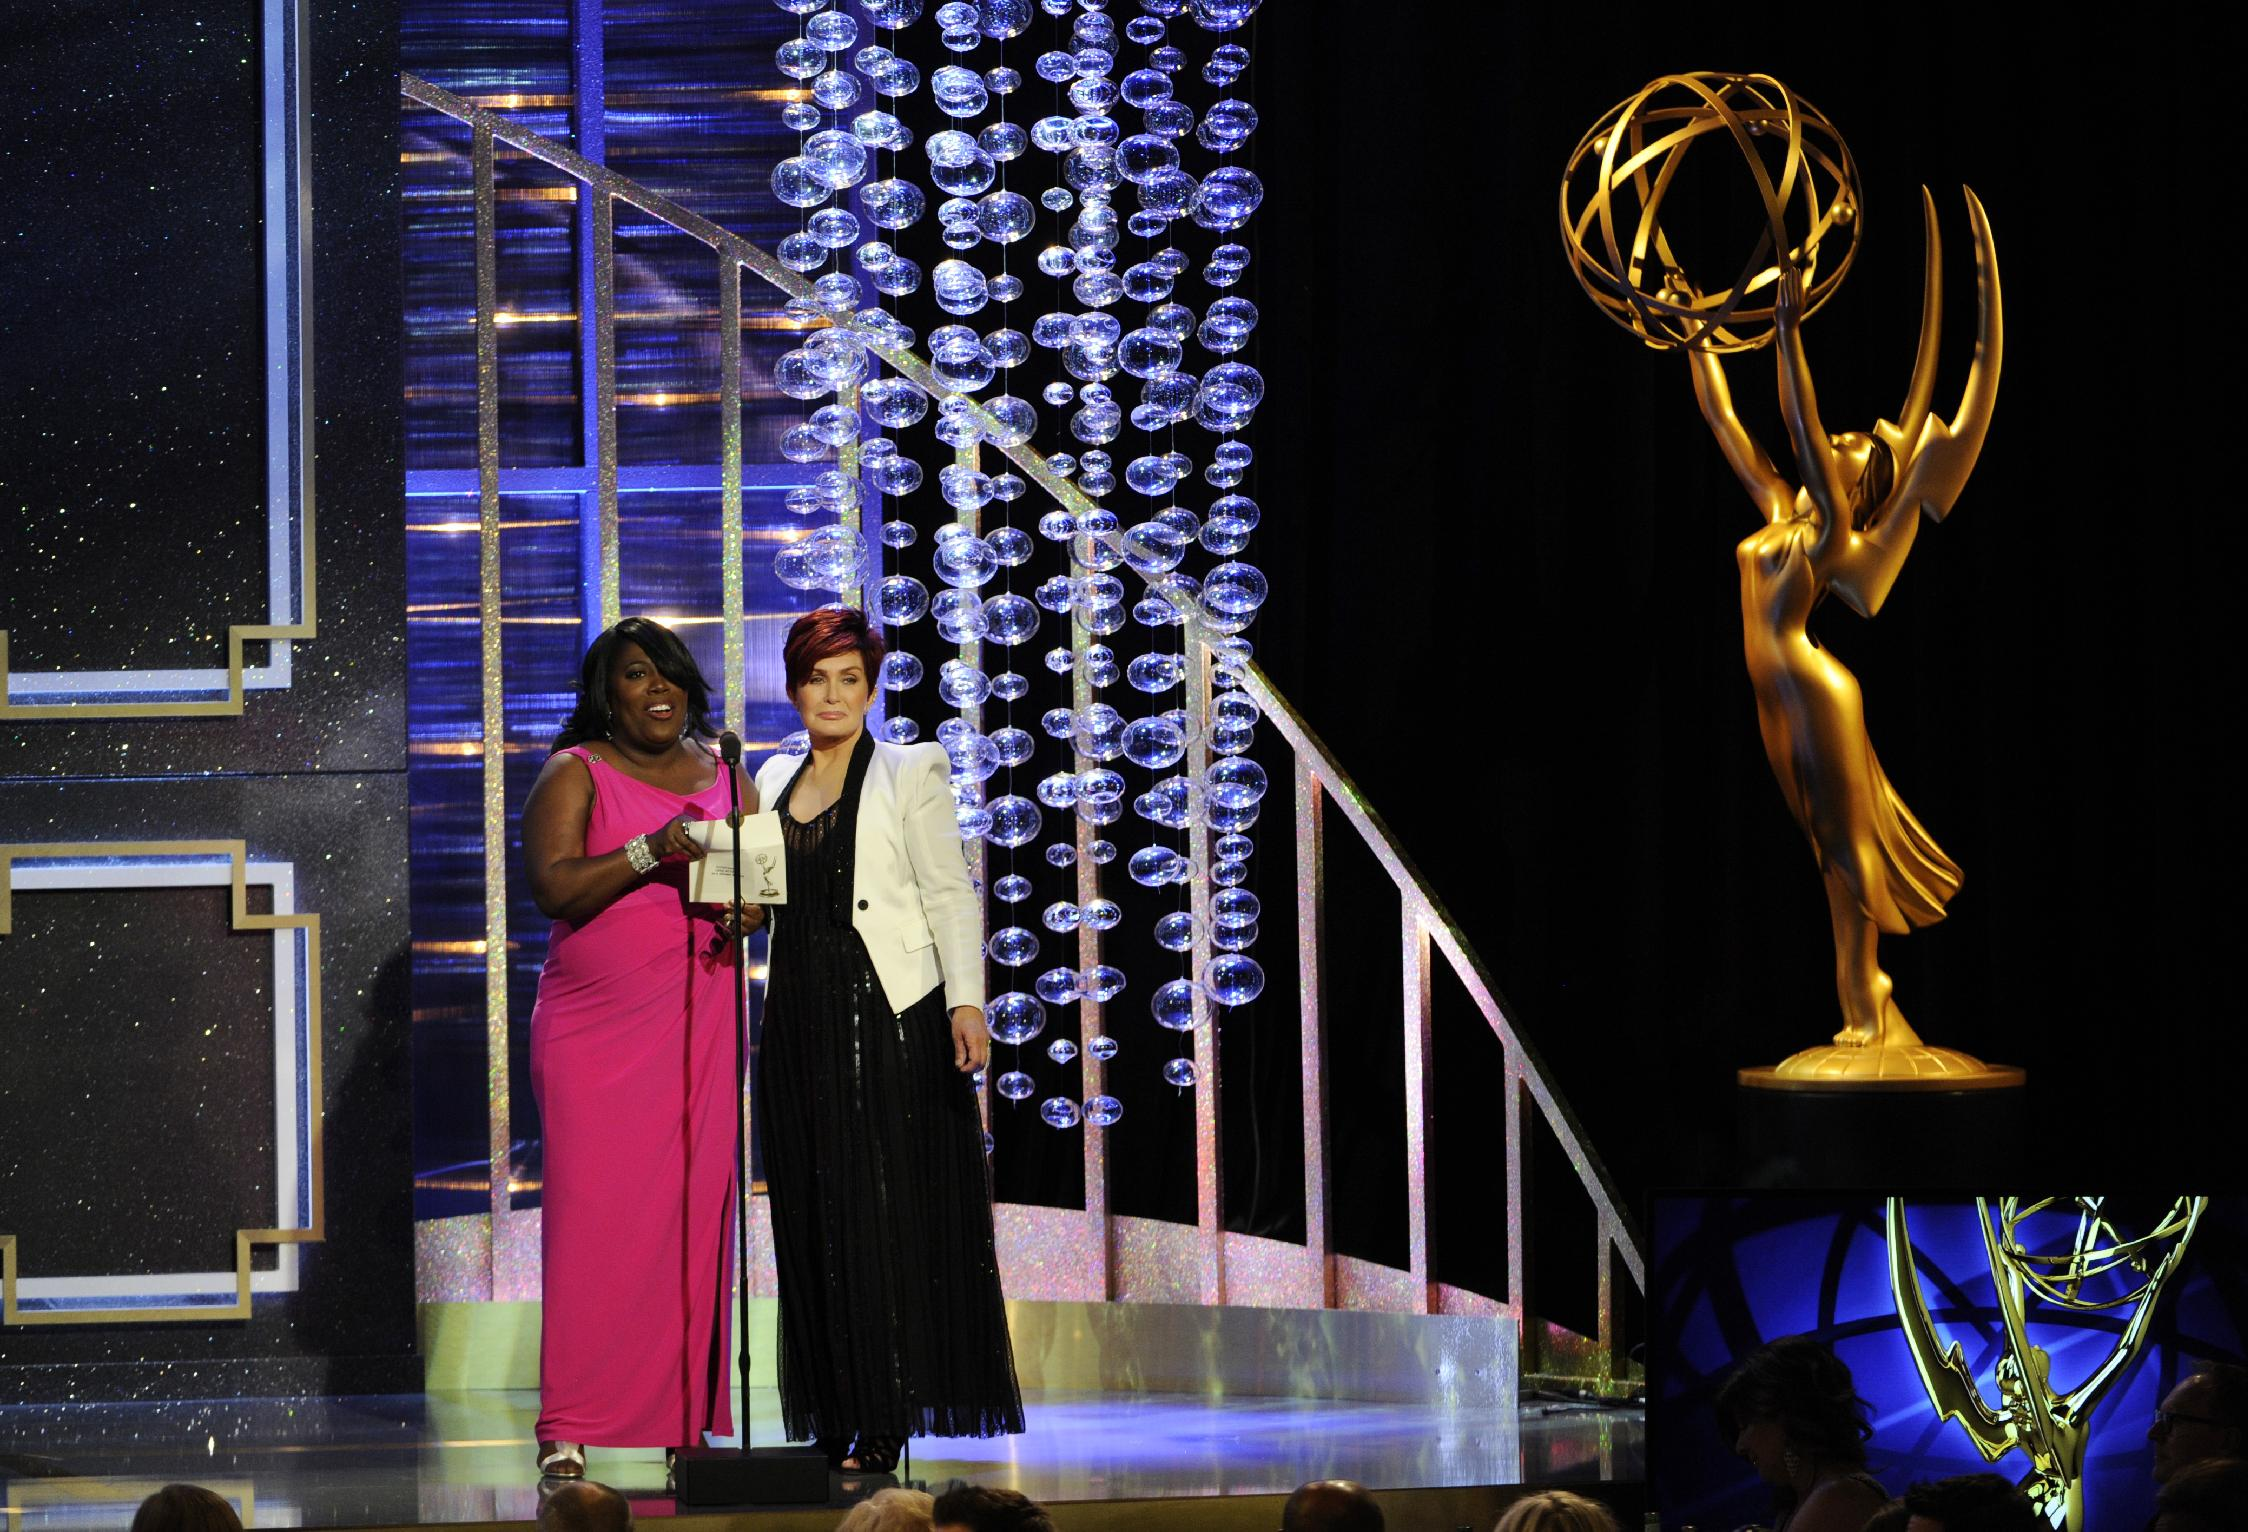 Pop channel bringing Daytime Emmys ceremony back to TV